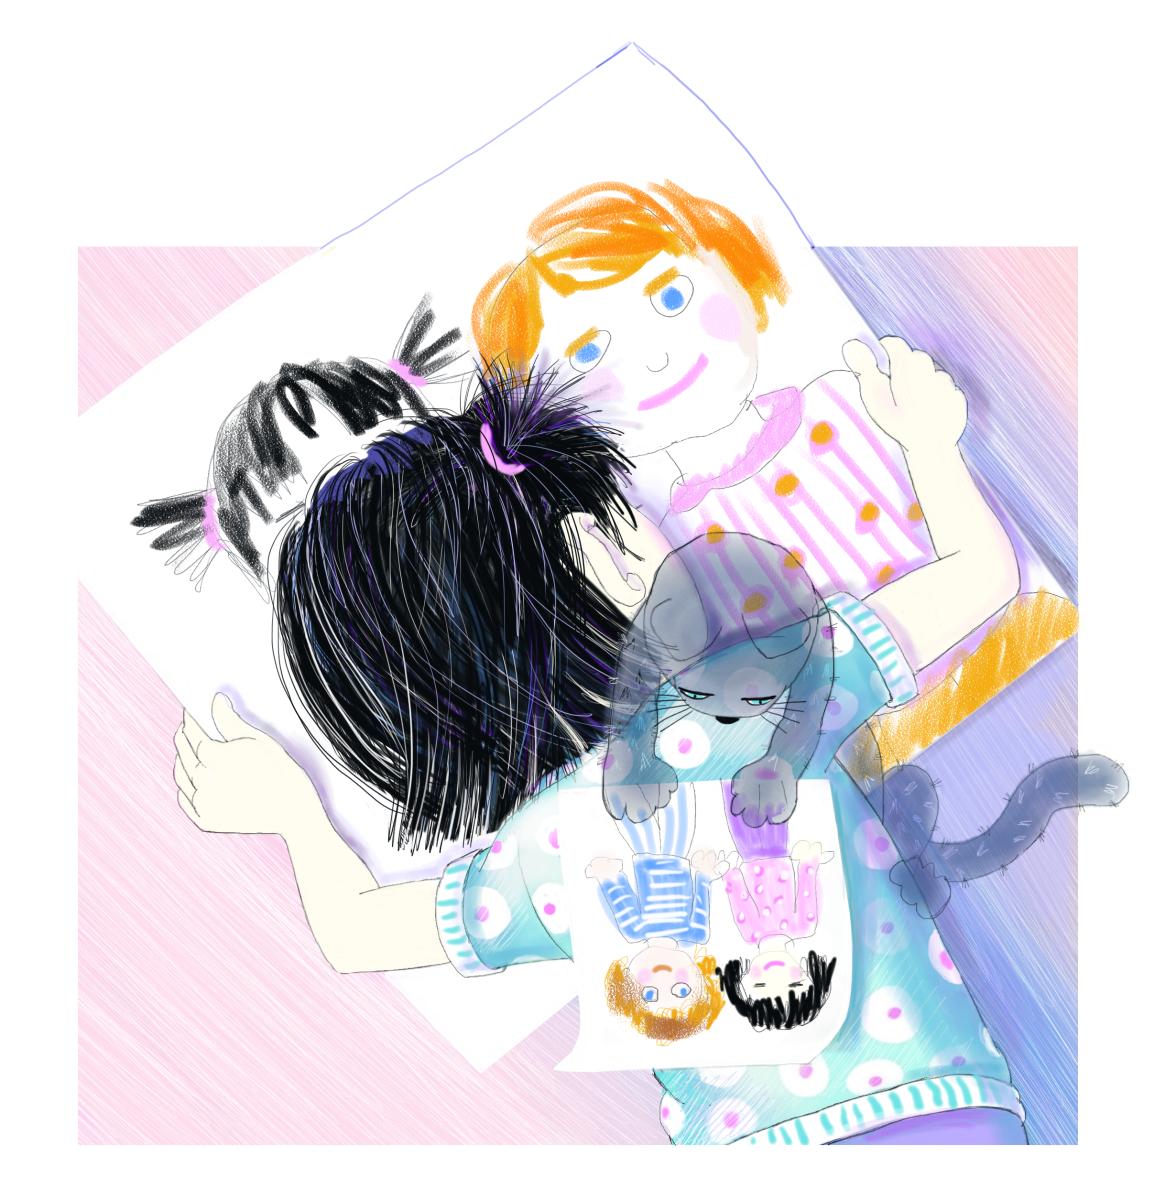 Jasmine draws future best friends, illustration by Elizabeth B Martin